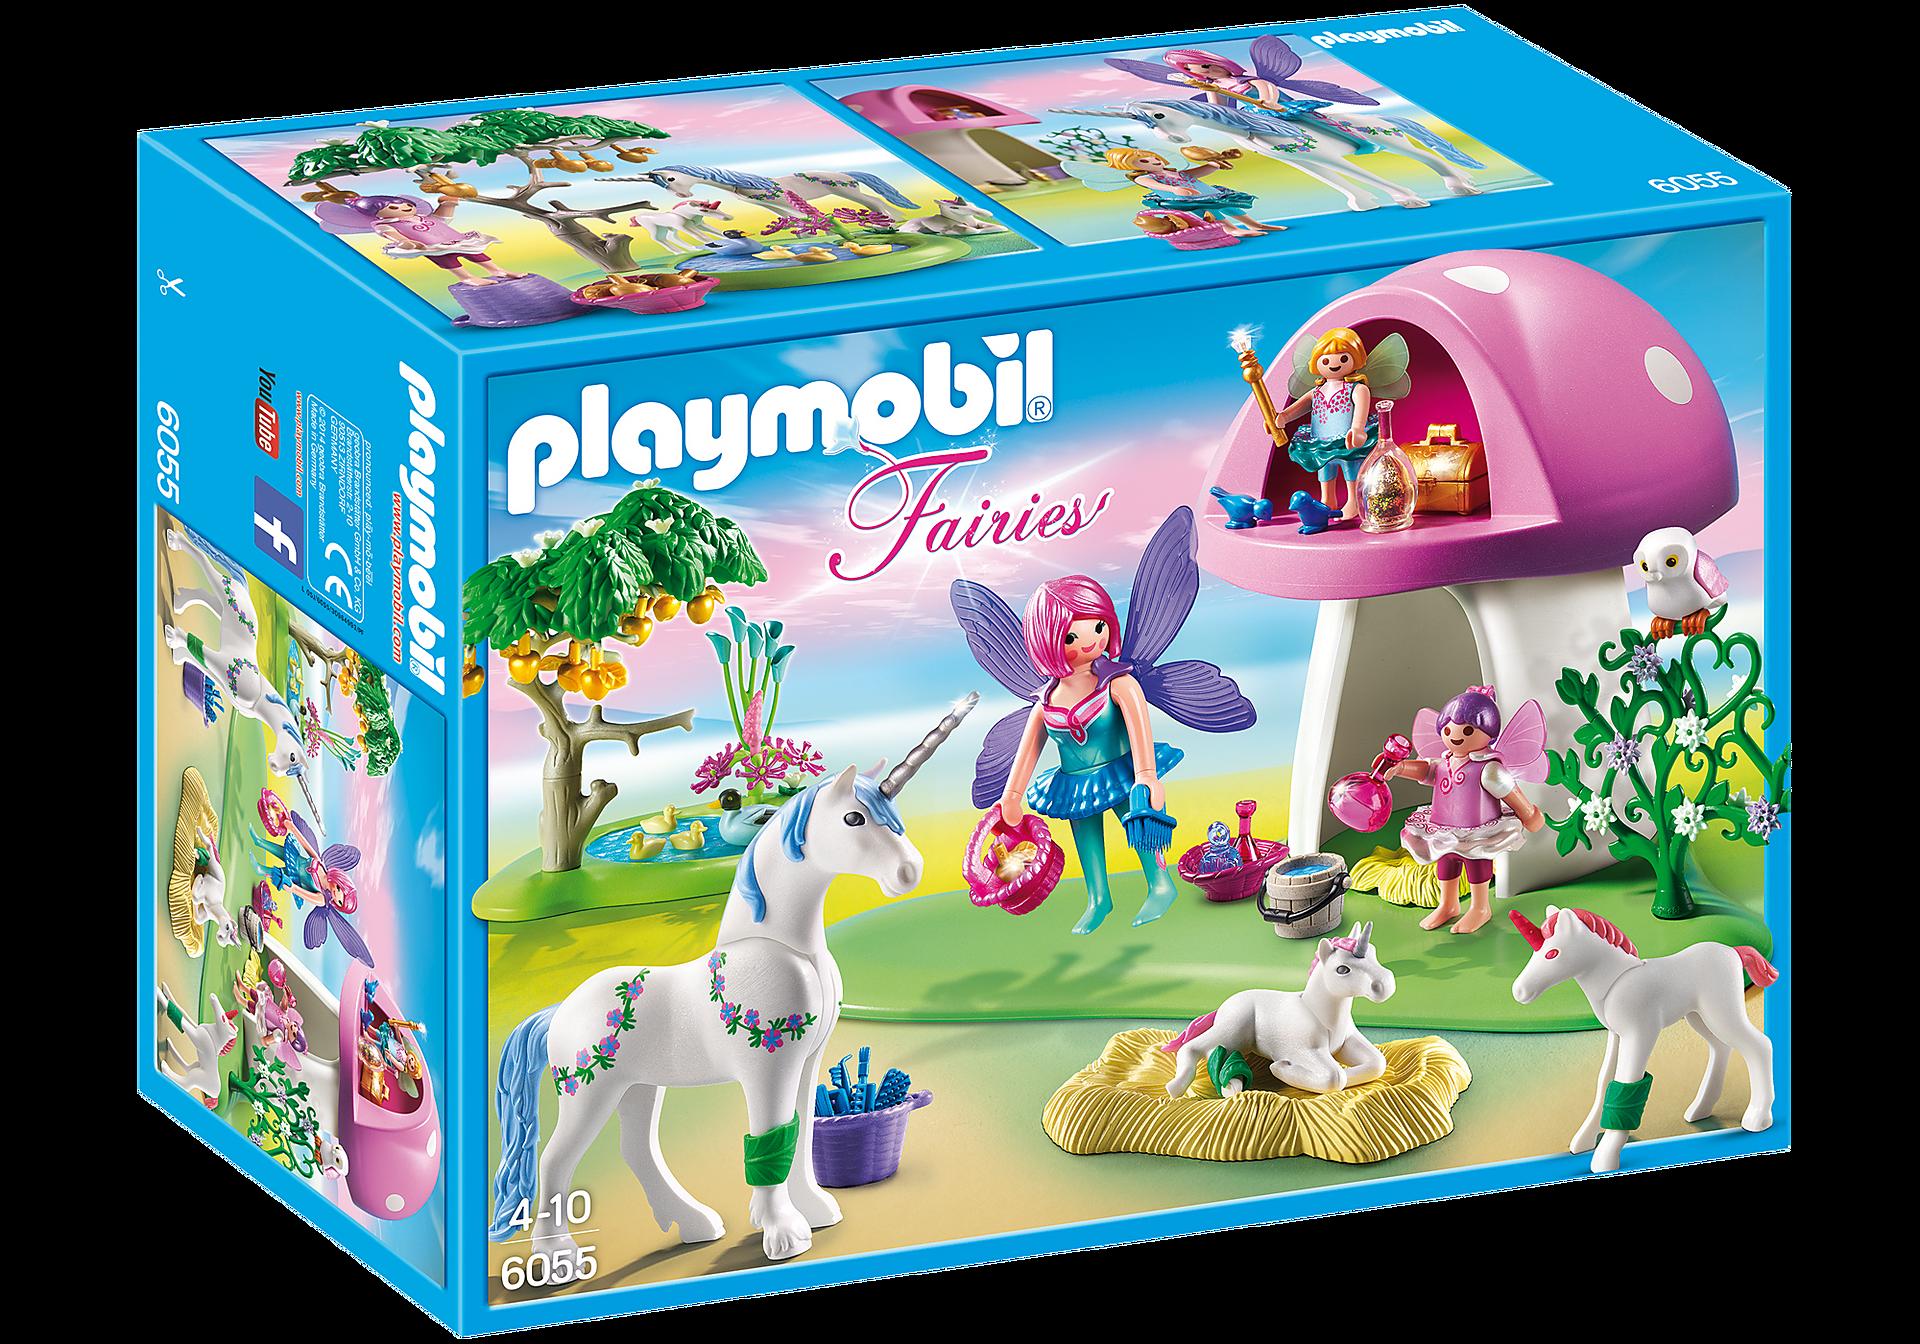 http://media.playmobil.com/i/playmobil/6055_product_box_front/Centre de soins pour licornes